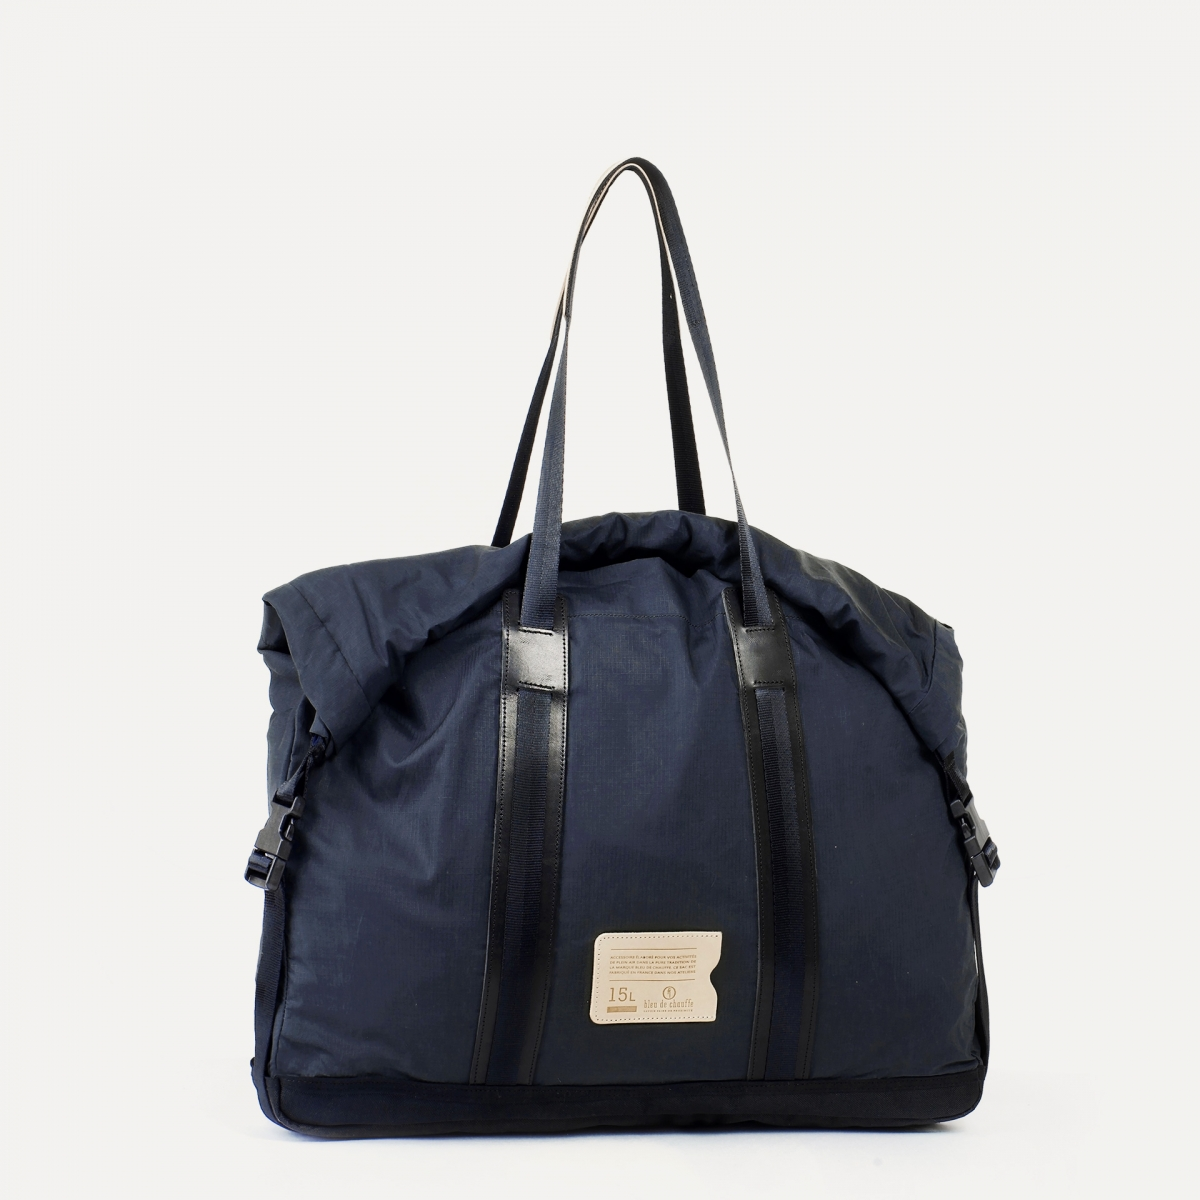 15L Barda Tote bag - Hague Blue (image n°2)